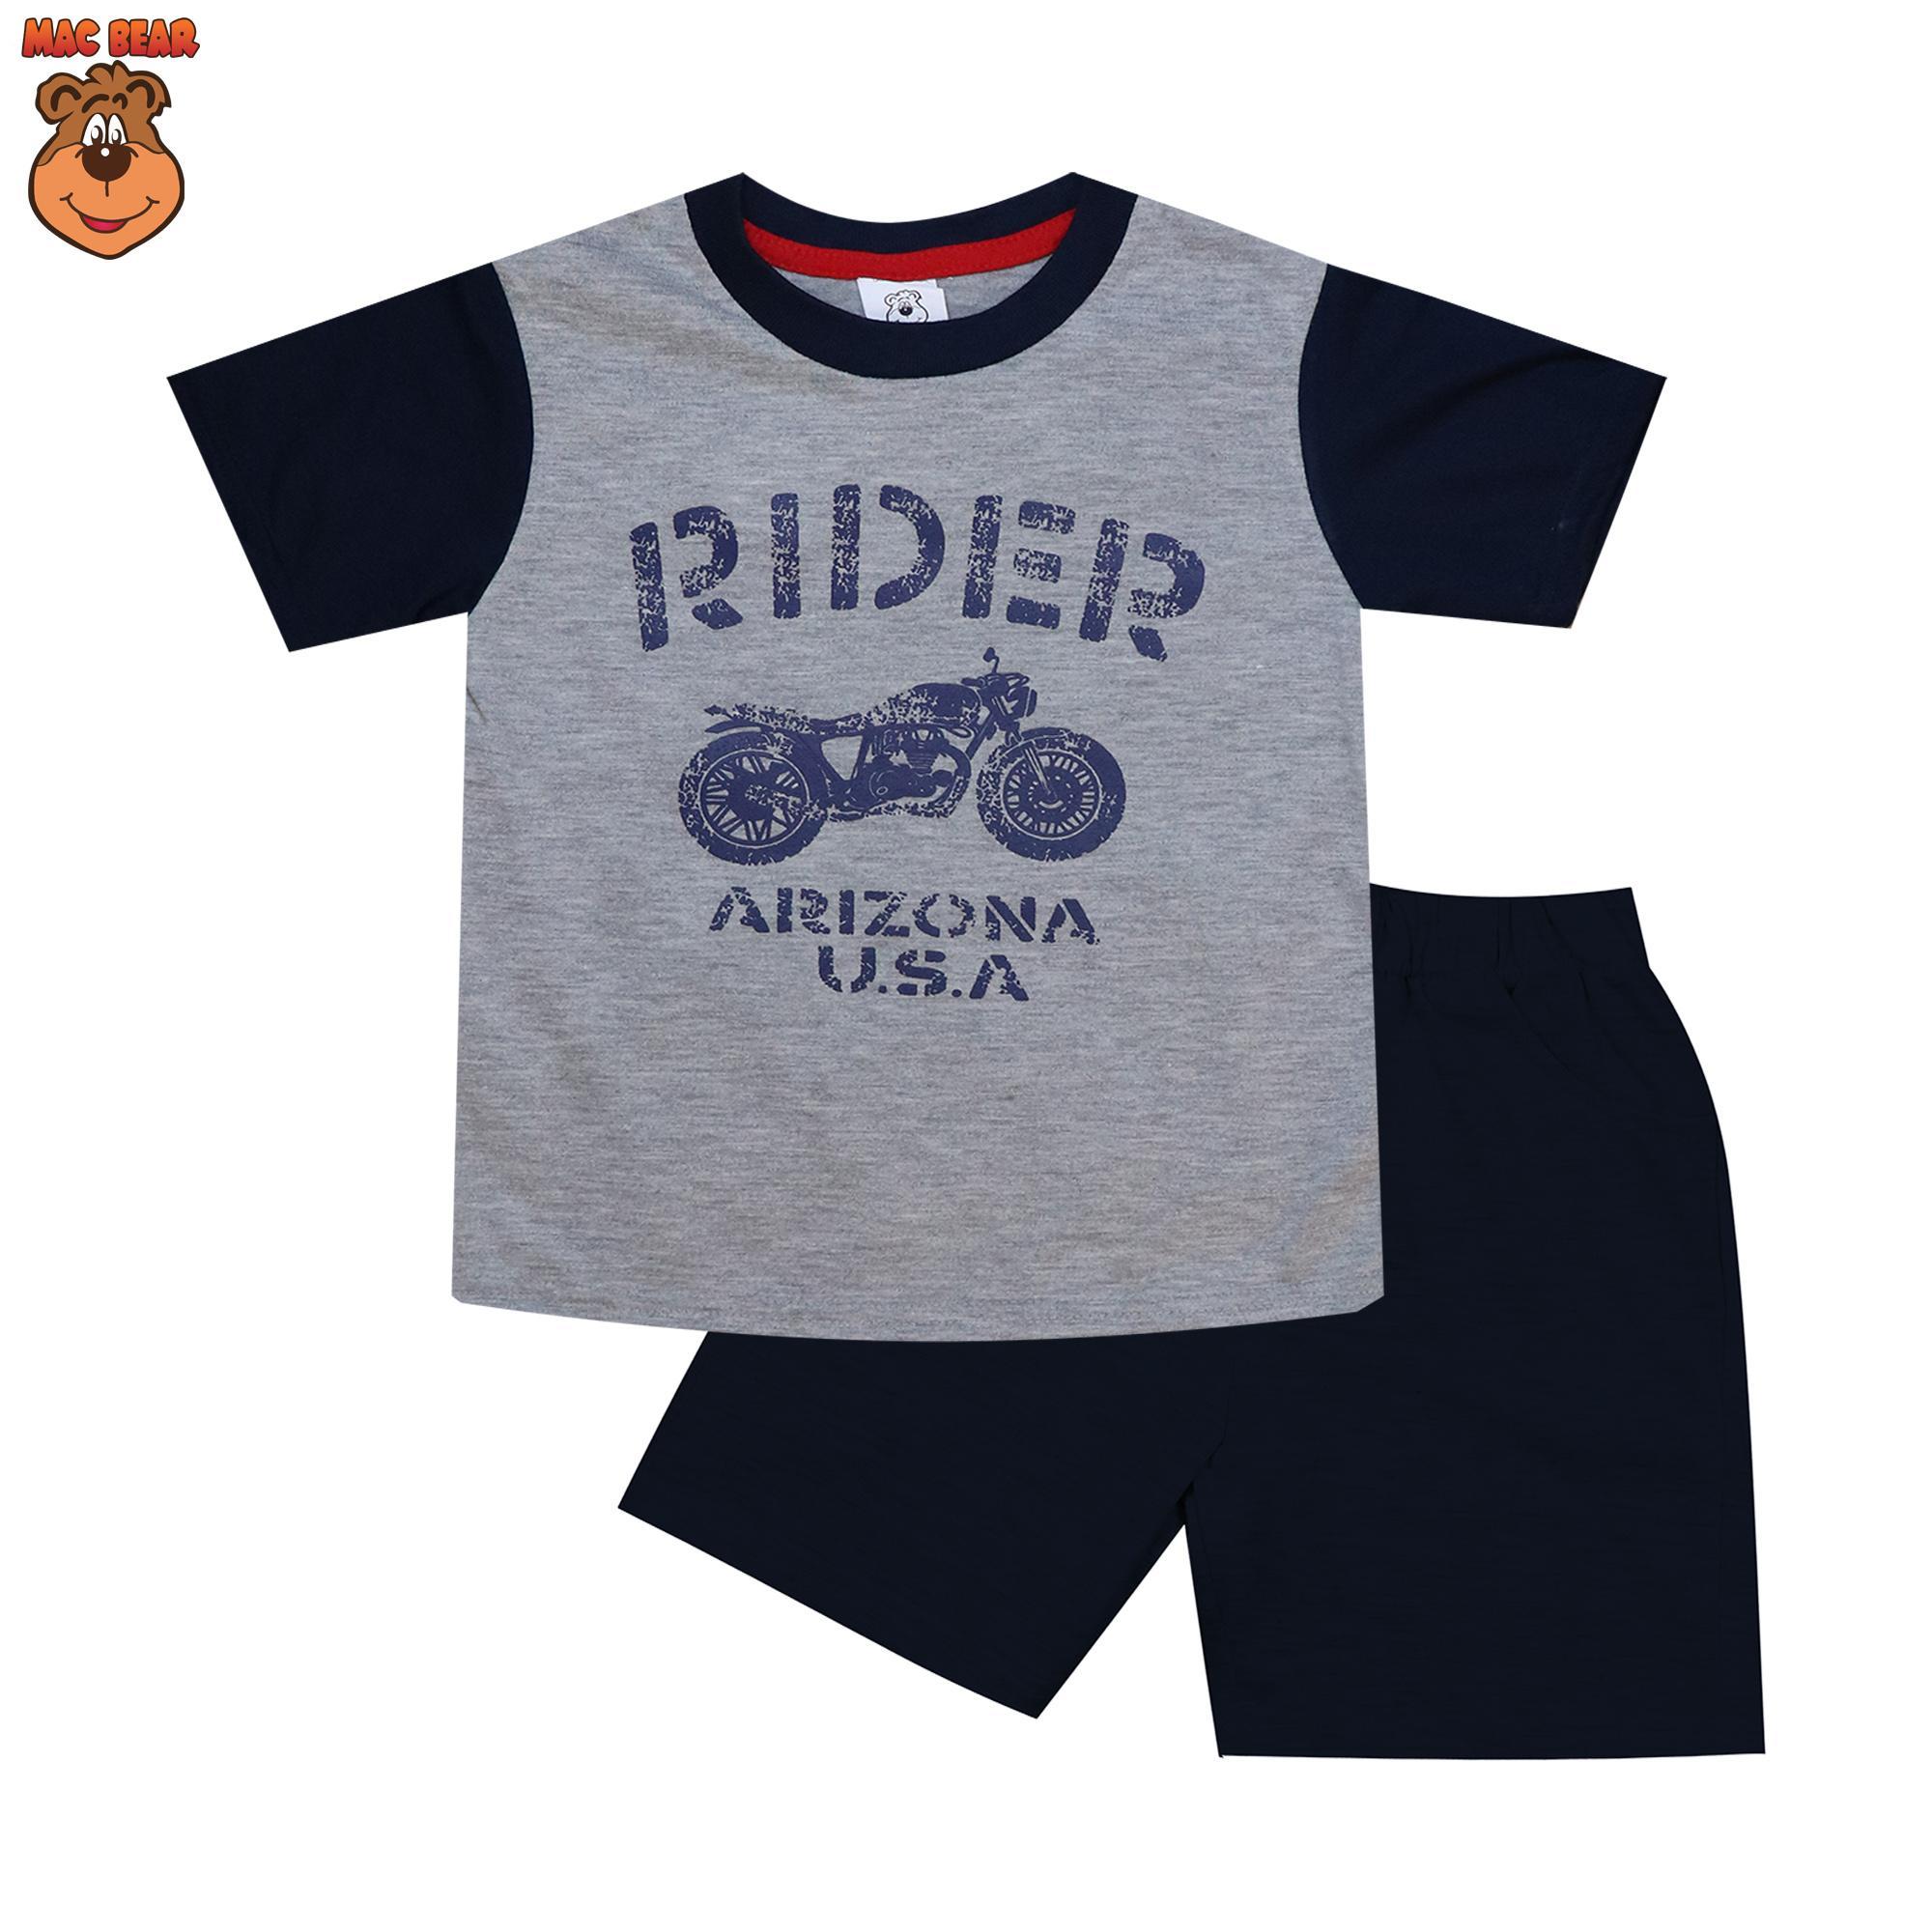 MacBear Kids Baju Anak Setelan Rider Arizona